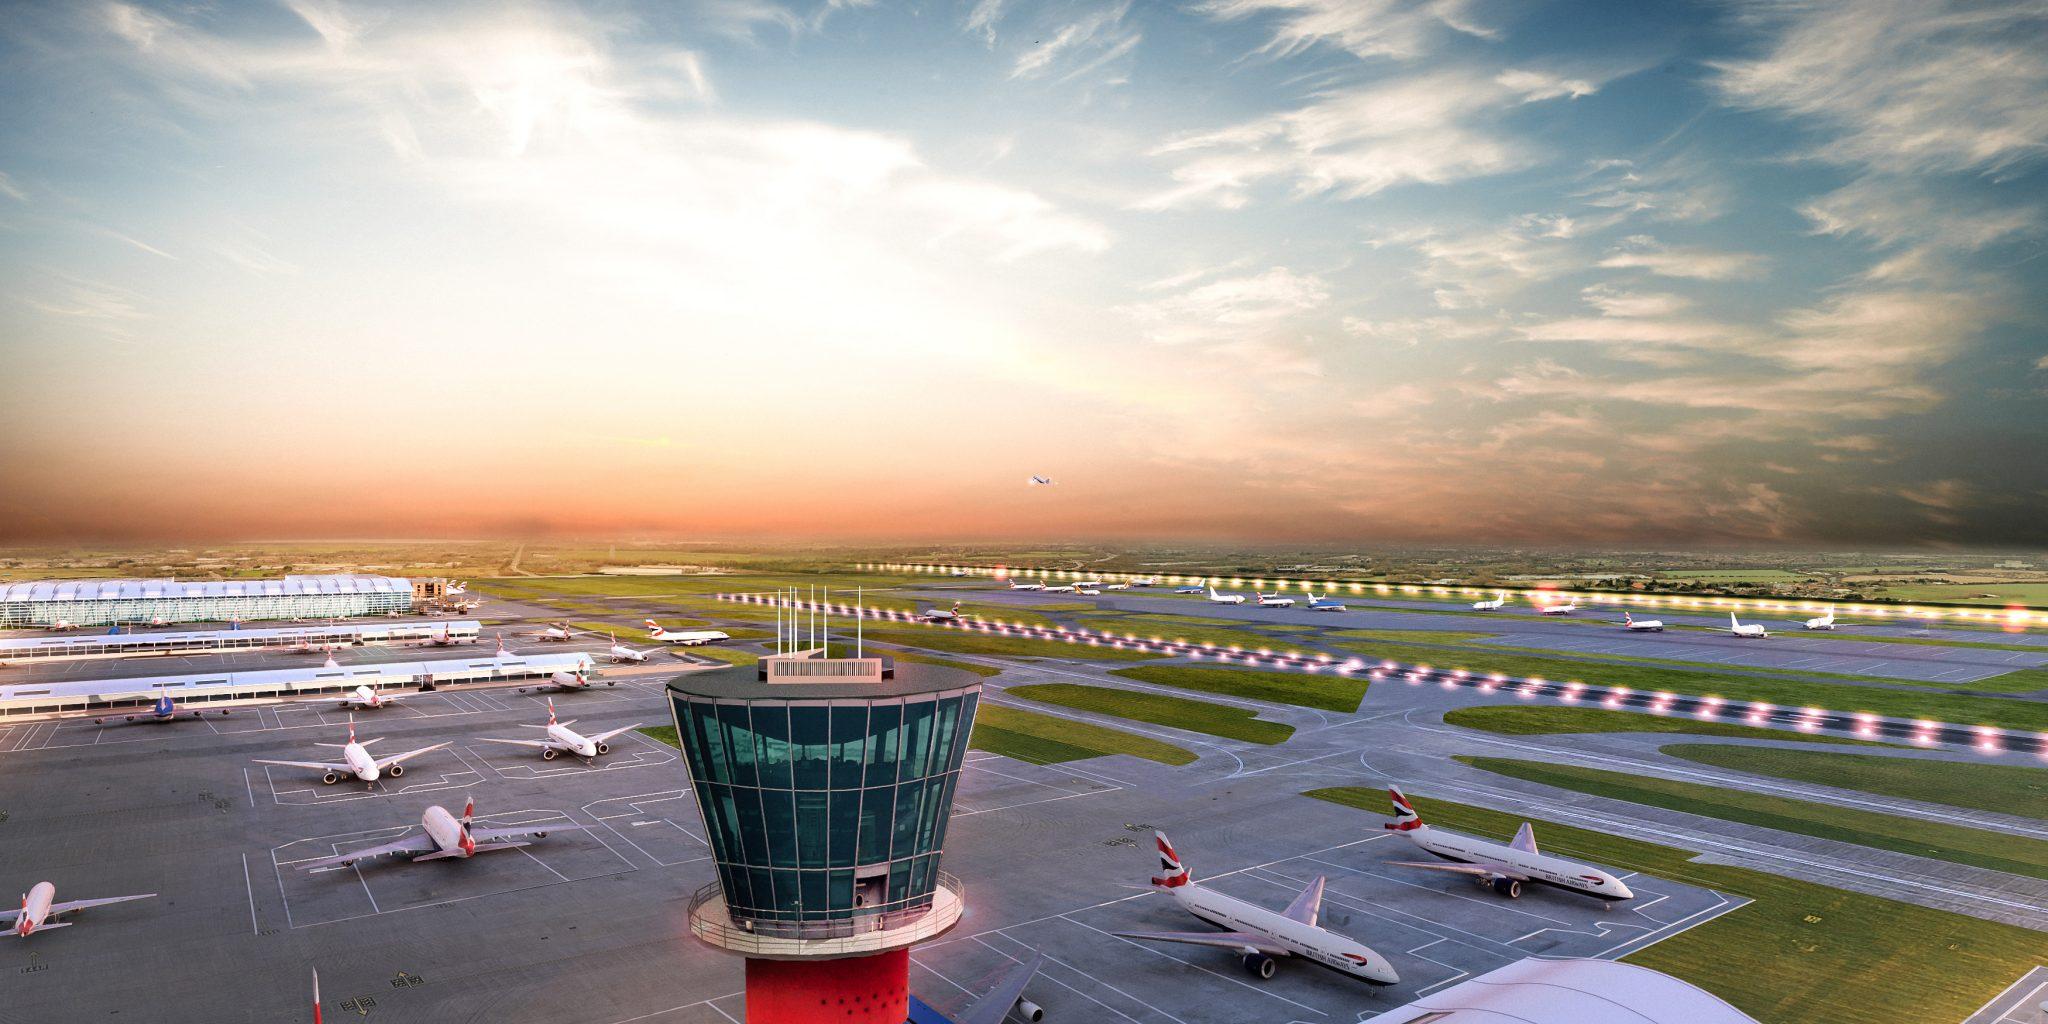 Visualization of the London Heathrow expansion. Image via London Heathrow.